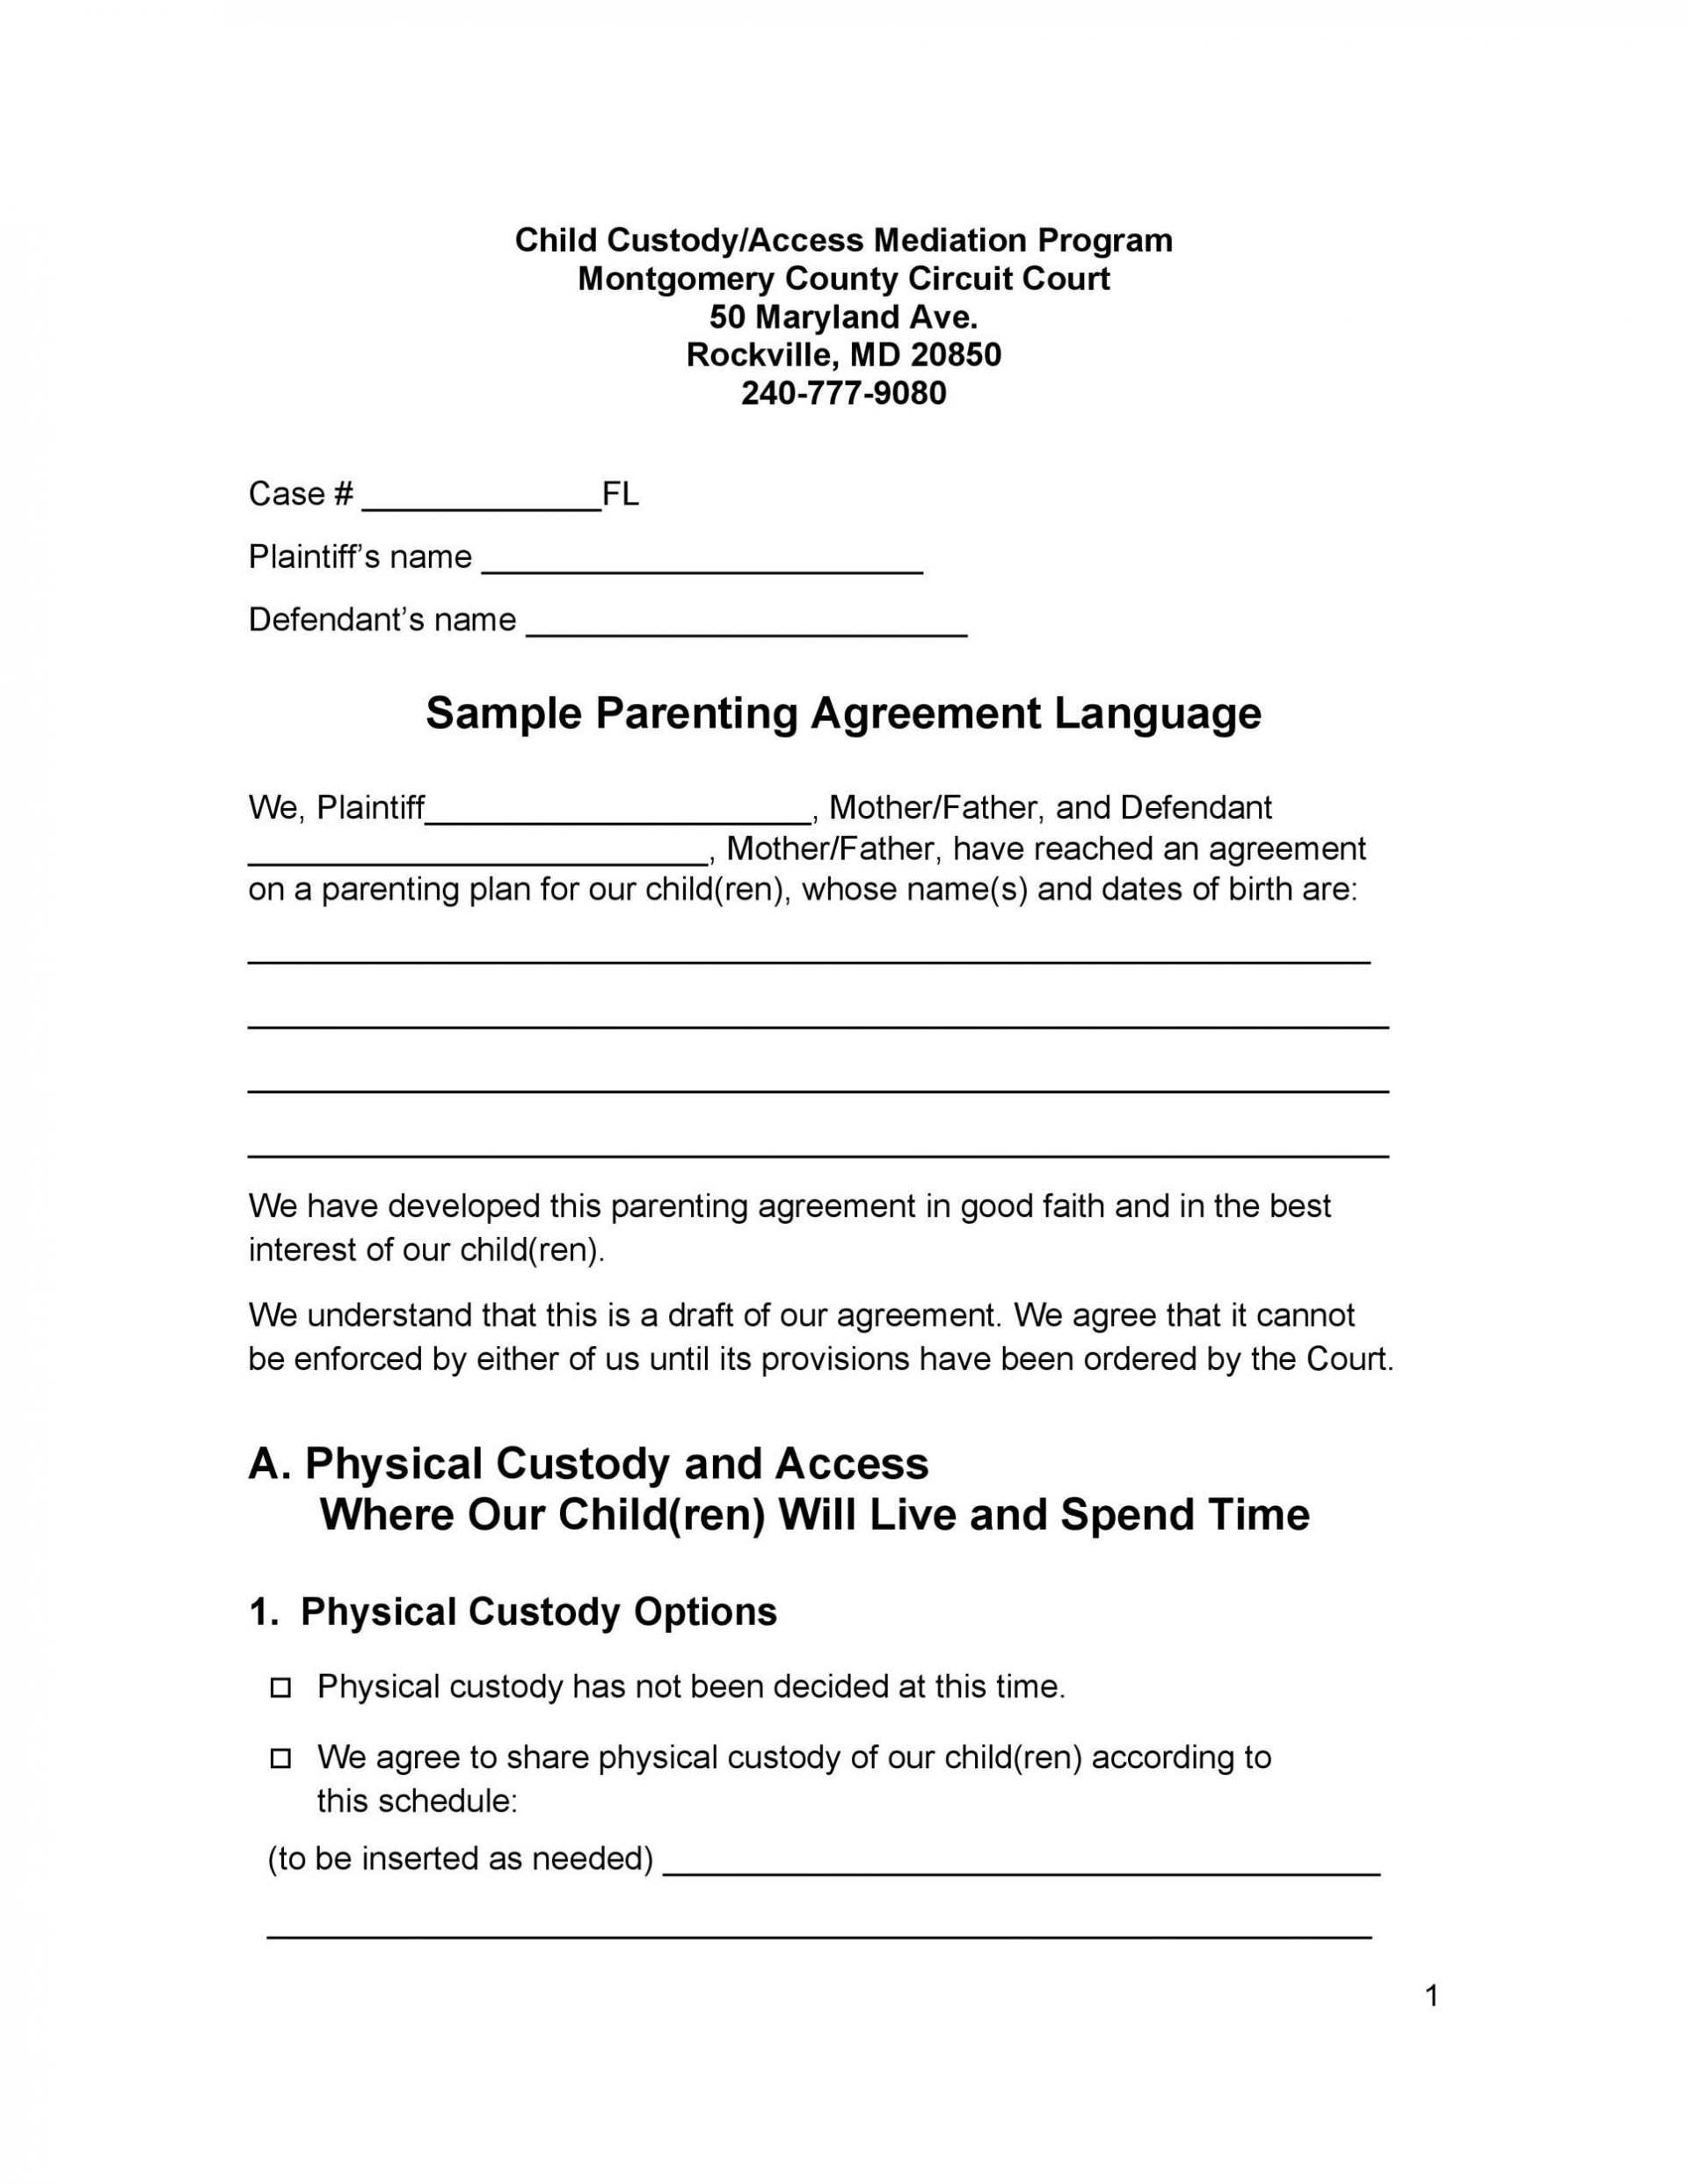 007 Top Child Custody Agreement Template High Definition  Texa Nc Visitation Uk1920